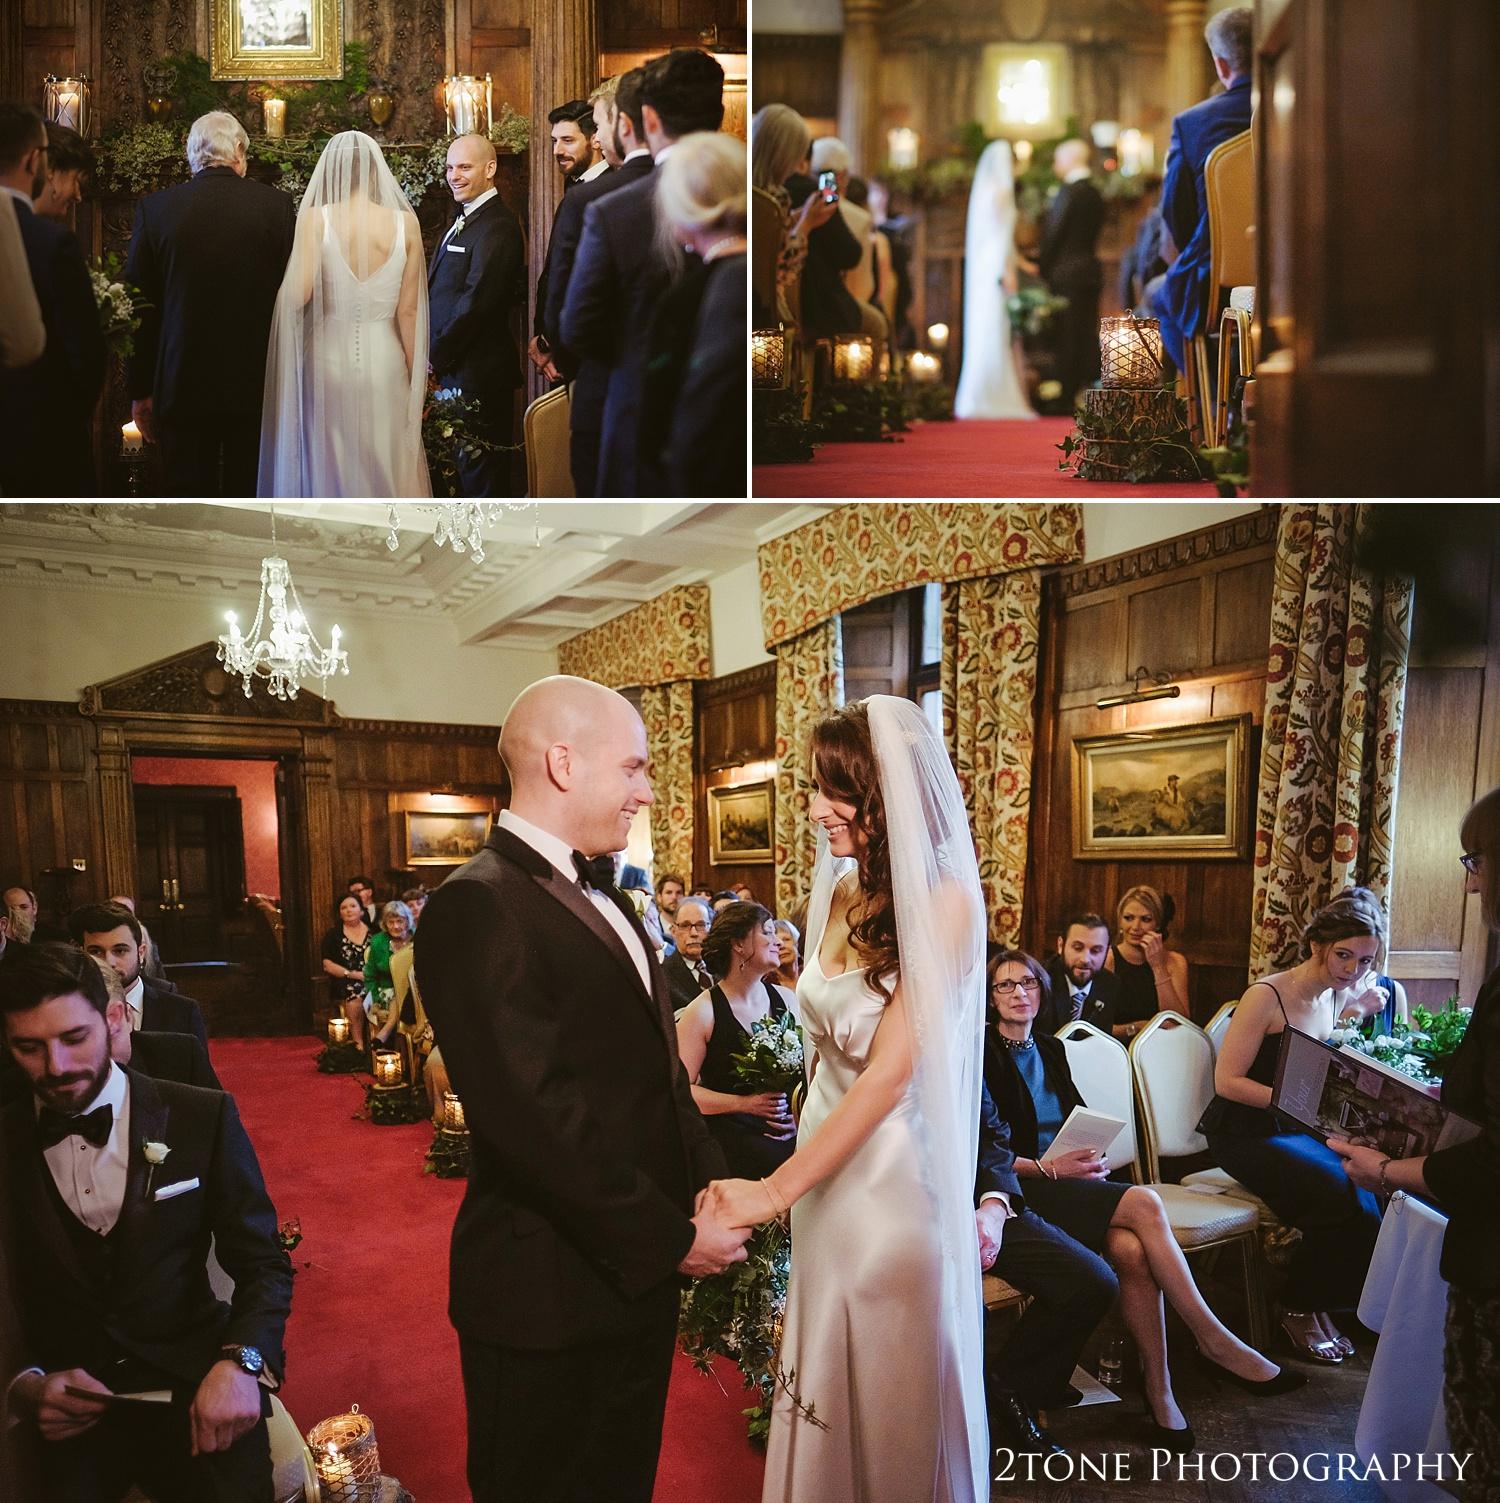 Wedding ceremony at Ellingham Hall. Winter wedding photography by www.2tonephotography.co.uk